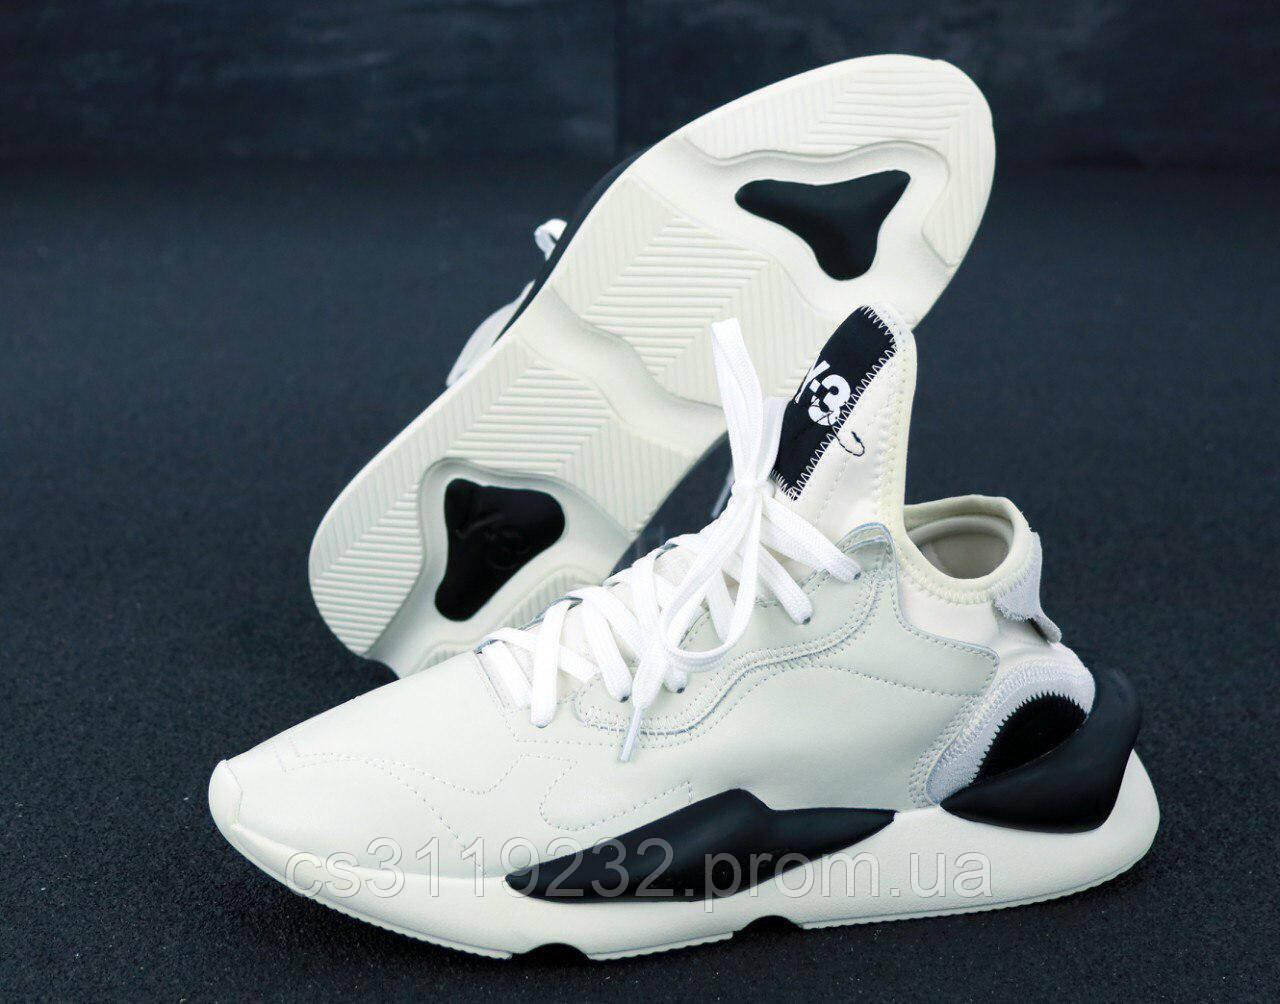 Мужские кроссовки Adidas Yohji Yamamoto Y-3 Kaiwa (белые)